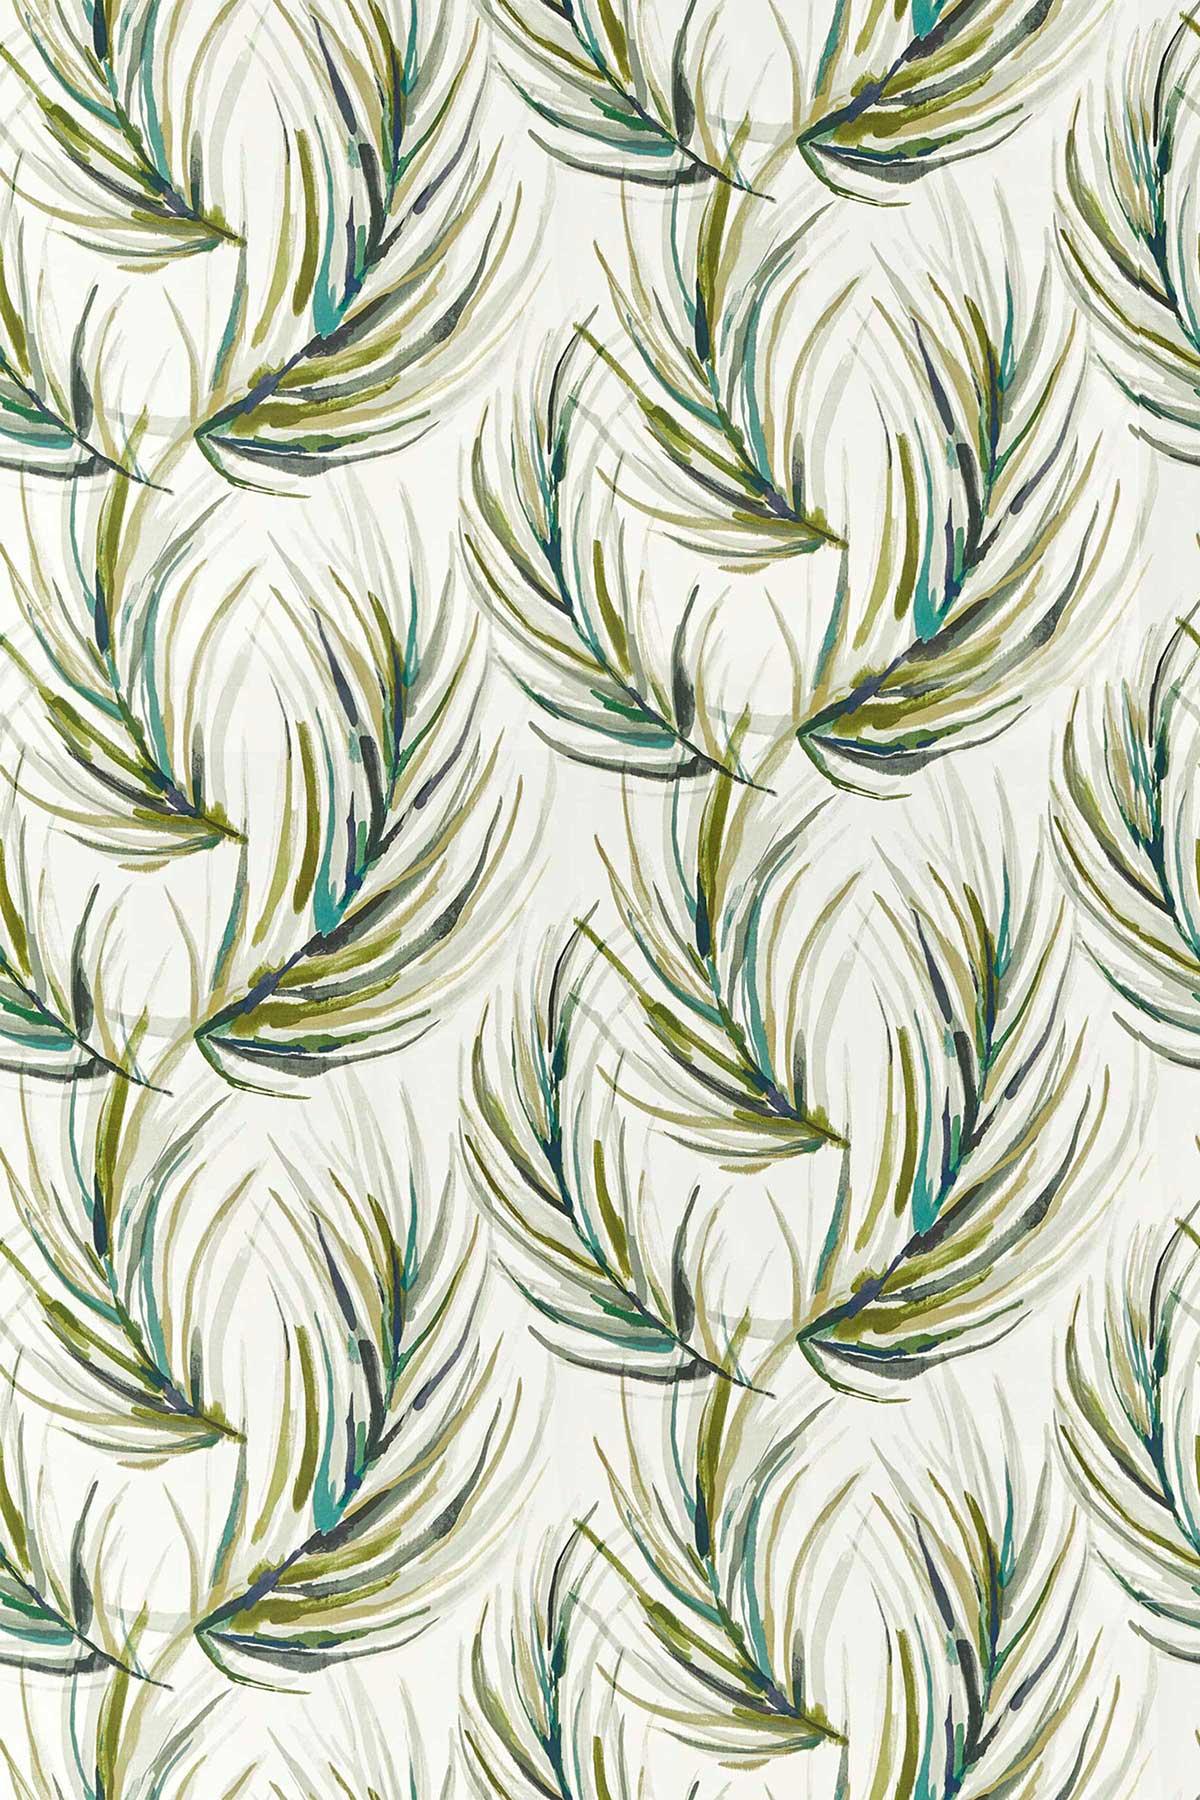 Alvaro Fabric - Lime / Jade / Palm - by Harlequin